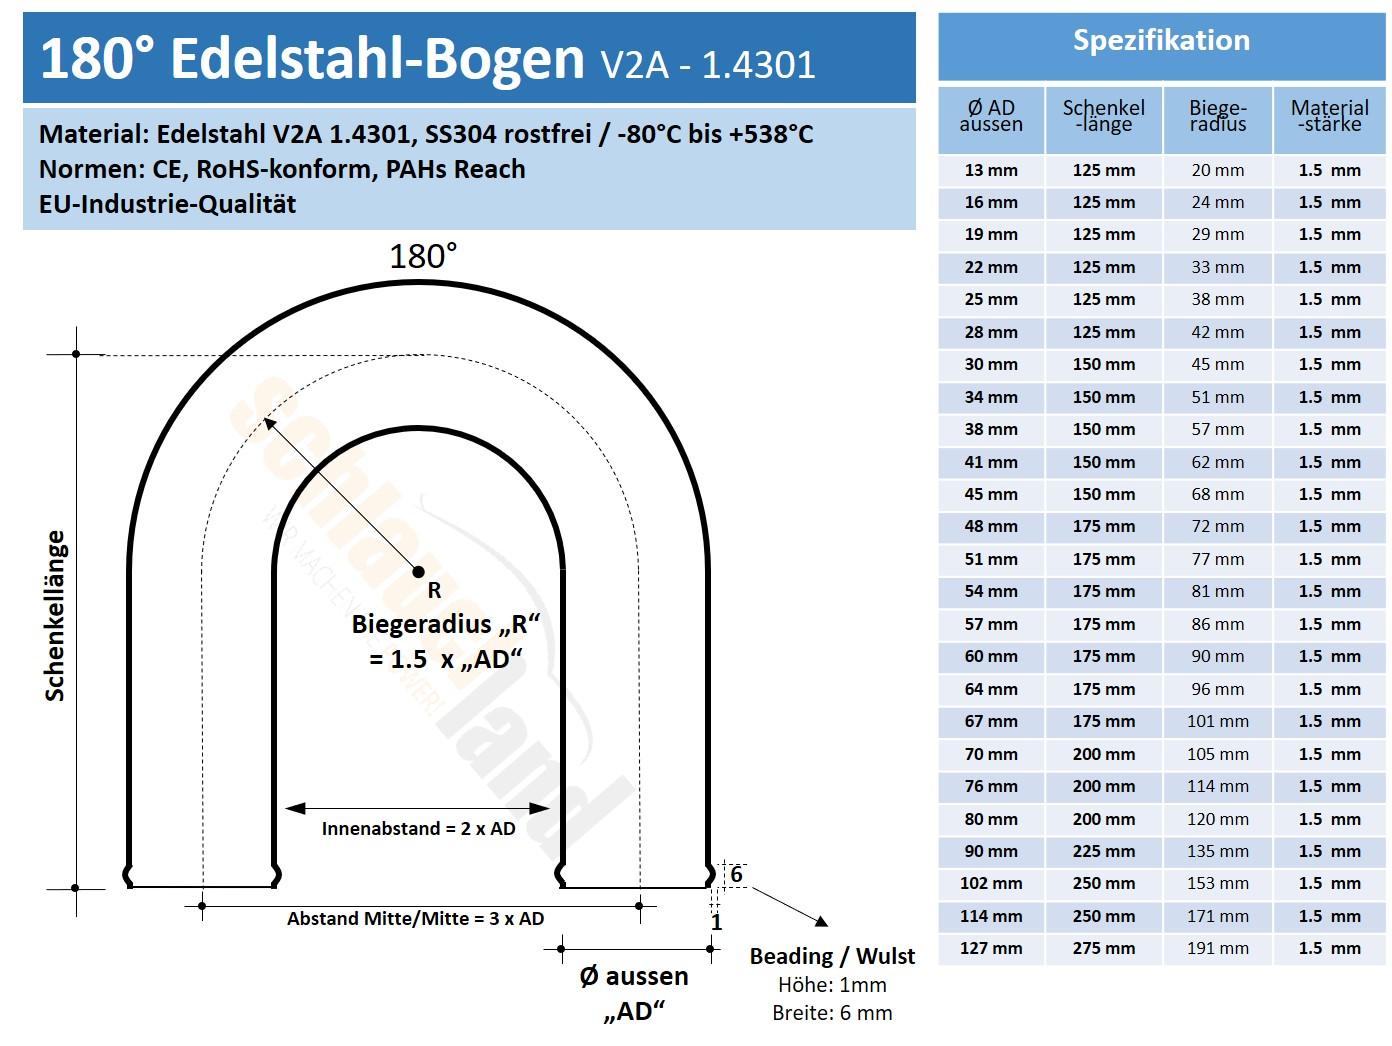 Datenblatt Edelstahl-Bogen 180° V2A